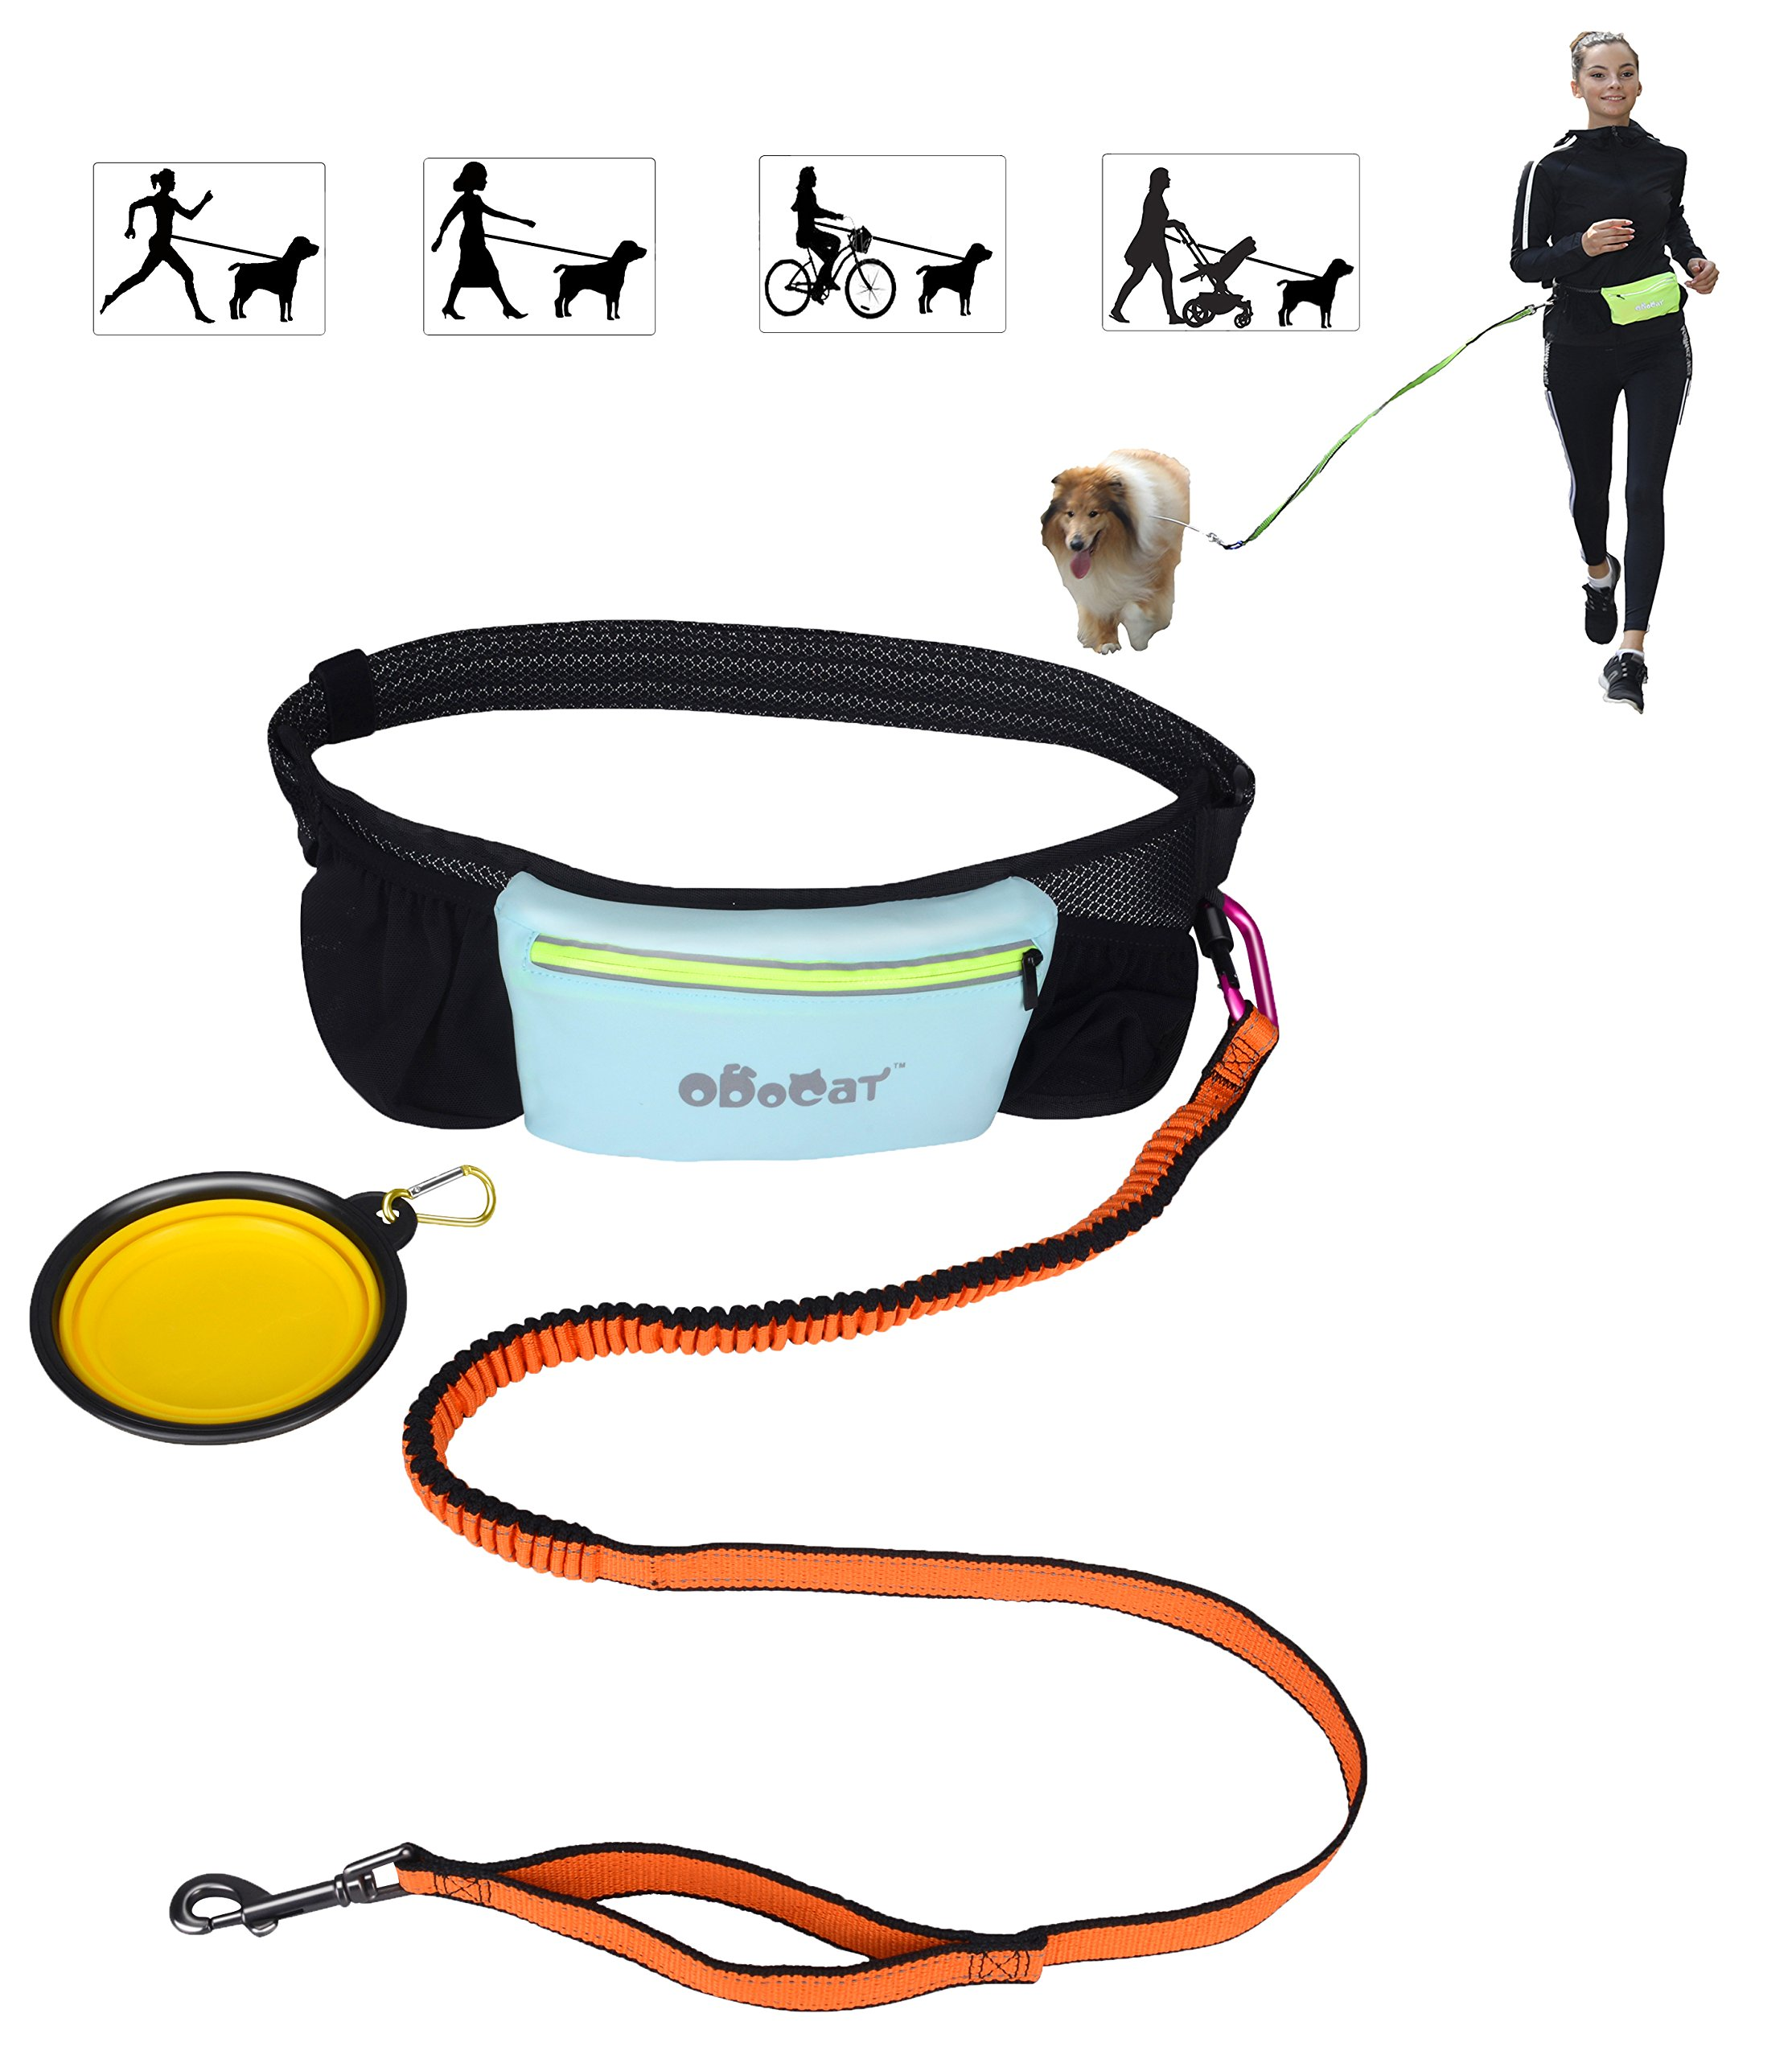 Odocat Hands Free Dog Leash for Walking, Jogging, Running with Shock Absorbing Bungee Adjustable Waist Belt Waterproof Zippered Pocket Foldable Travel Dog Bowl Ideal for Medium to Large Dogs